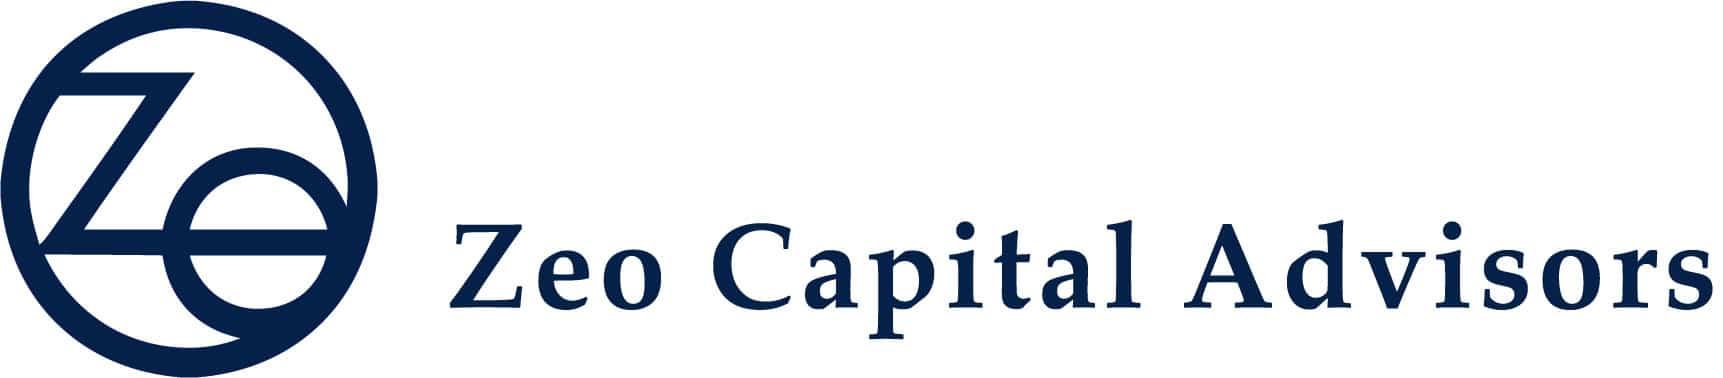 Zeo Capital